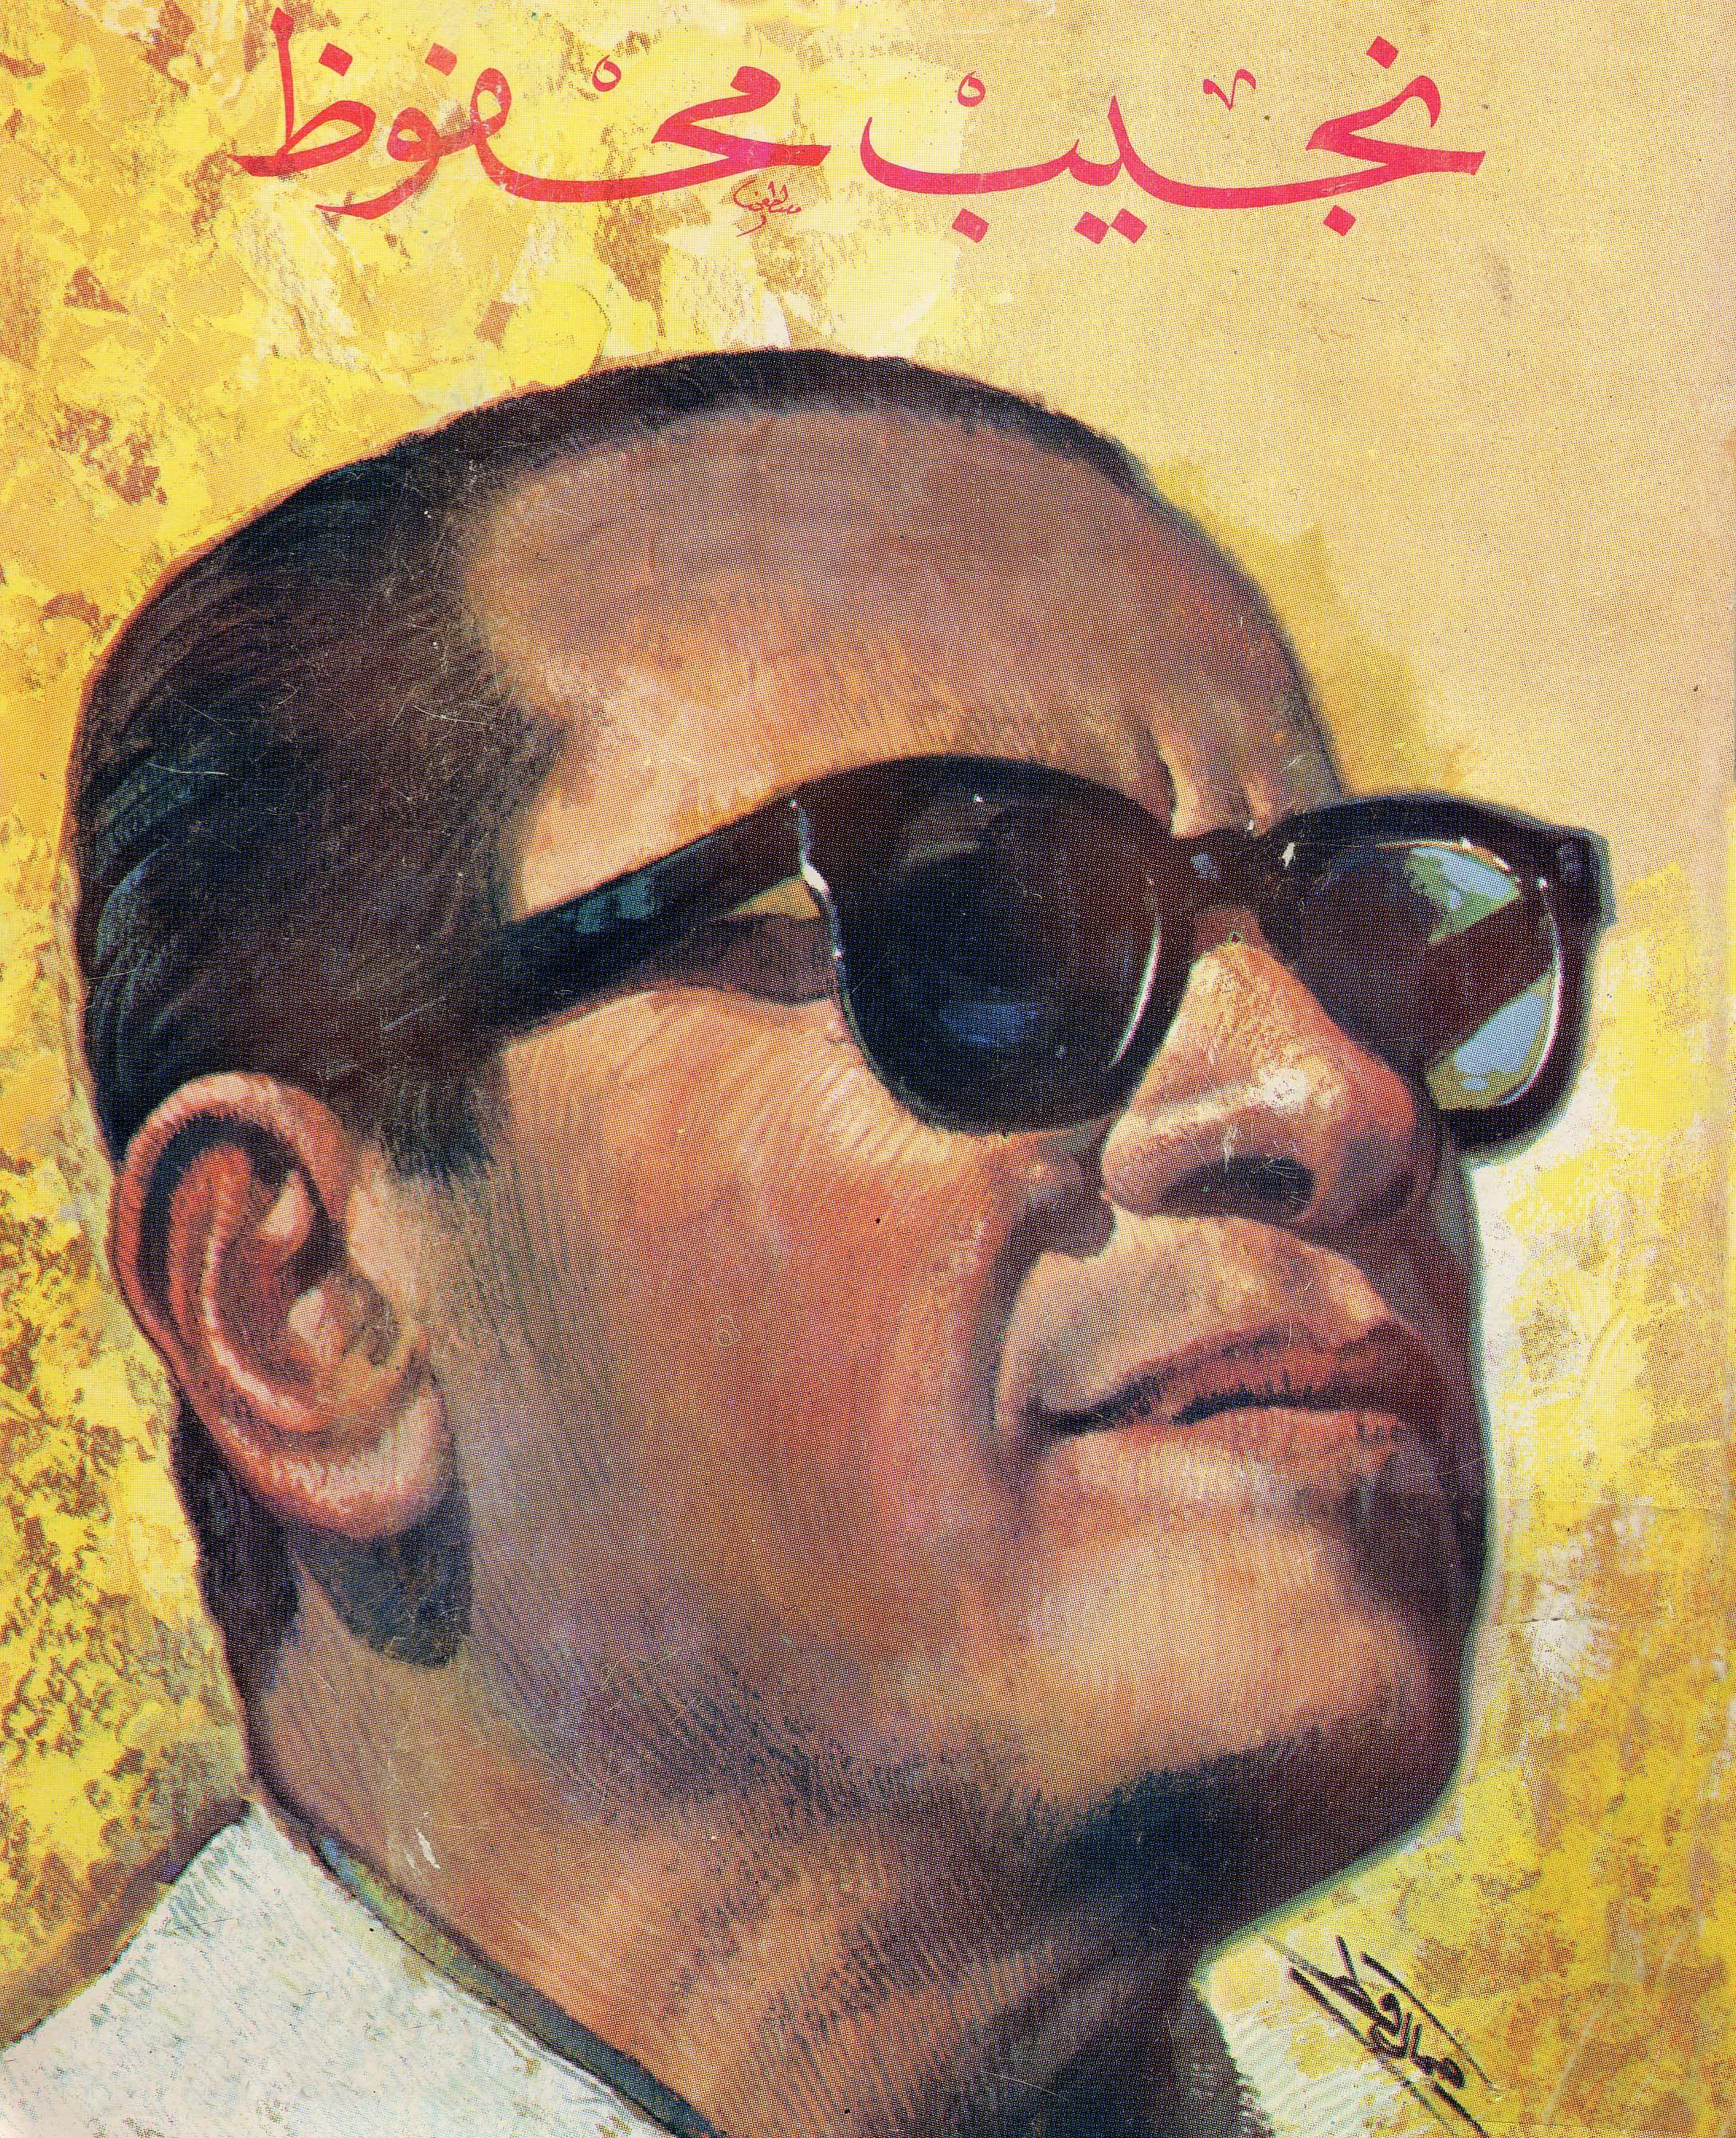 naguib mahfouz Enjoy the best naguib mahfouz quotes at brainyquote quotations by naguib  mahfouz, egyptian novelist, born december 11, 1911.